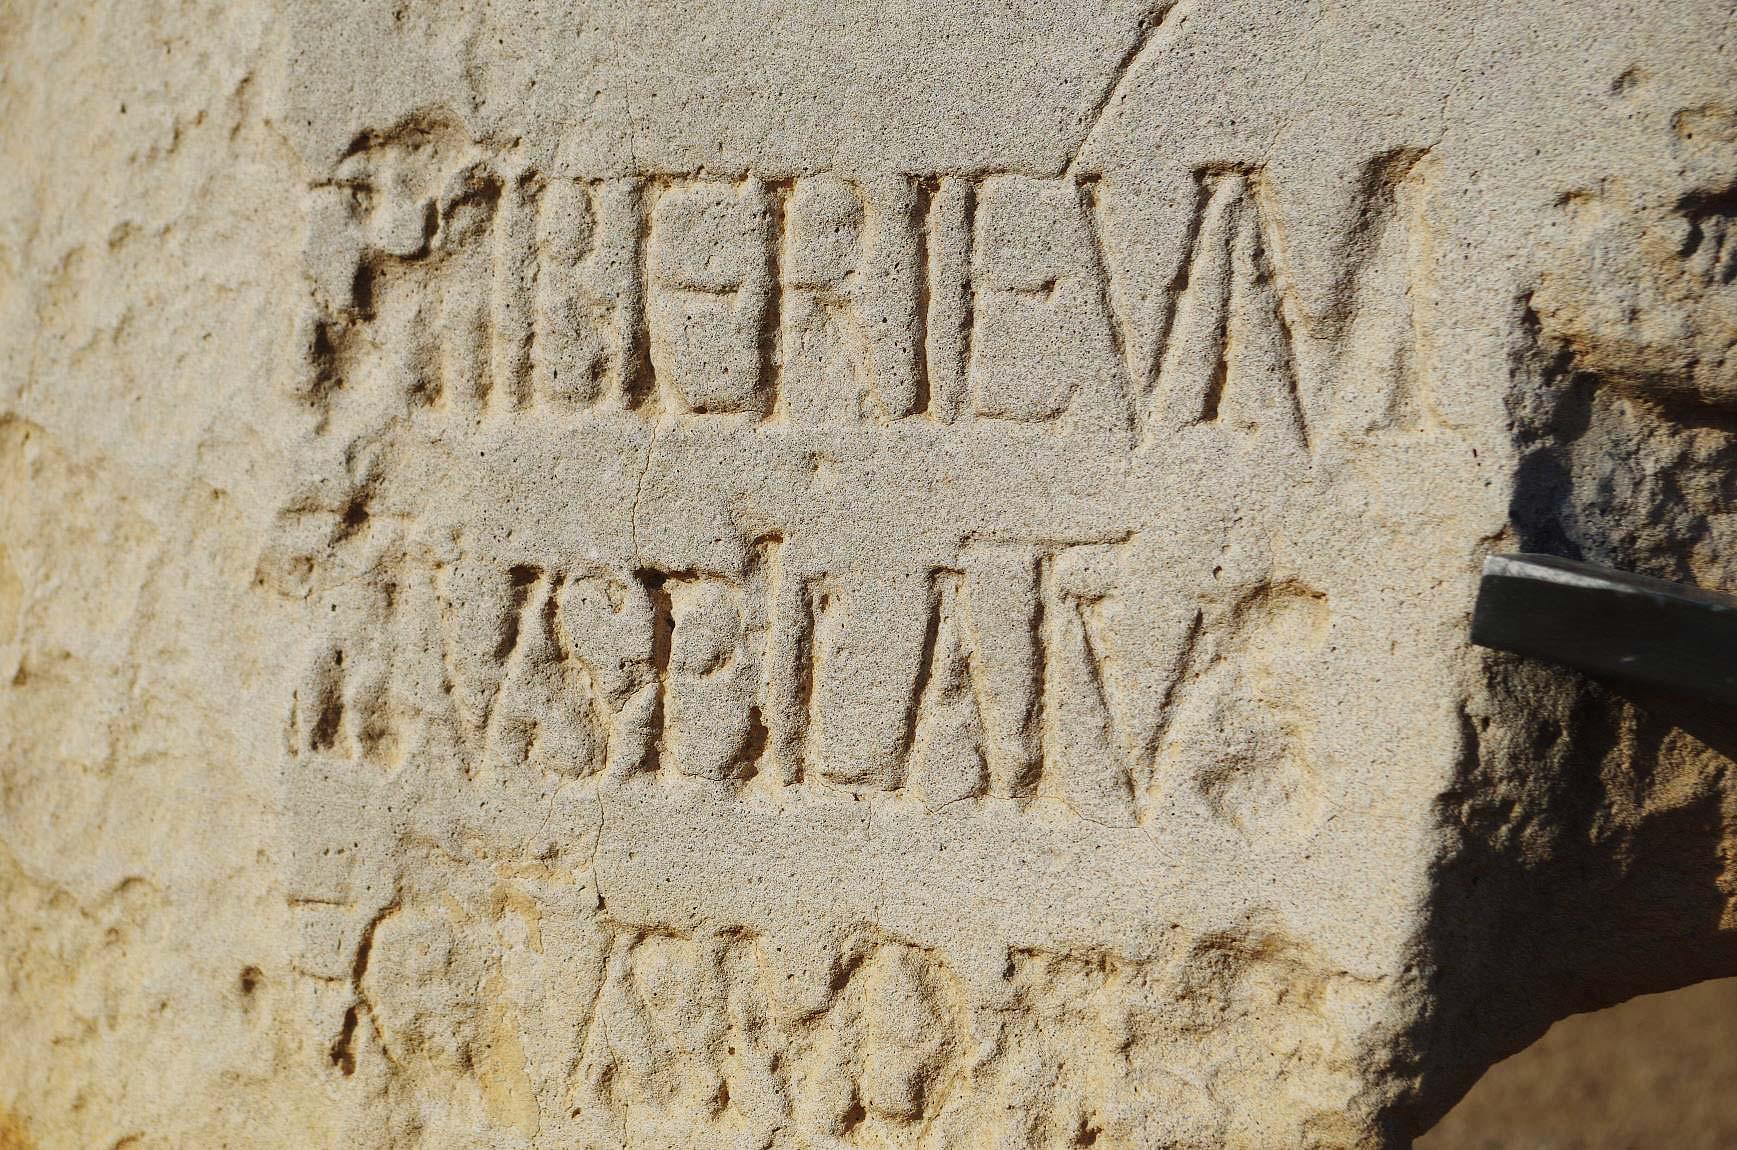 Pilatusinschrift in Caesarea